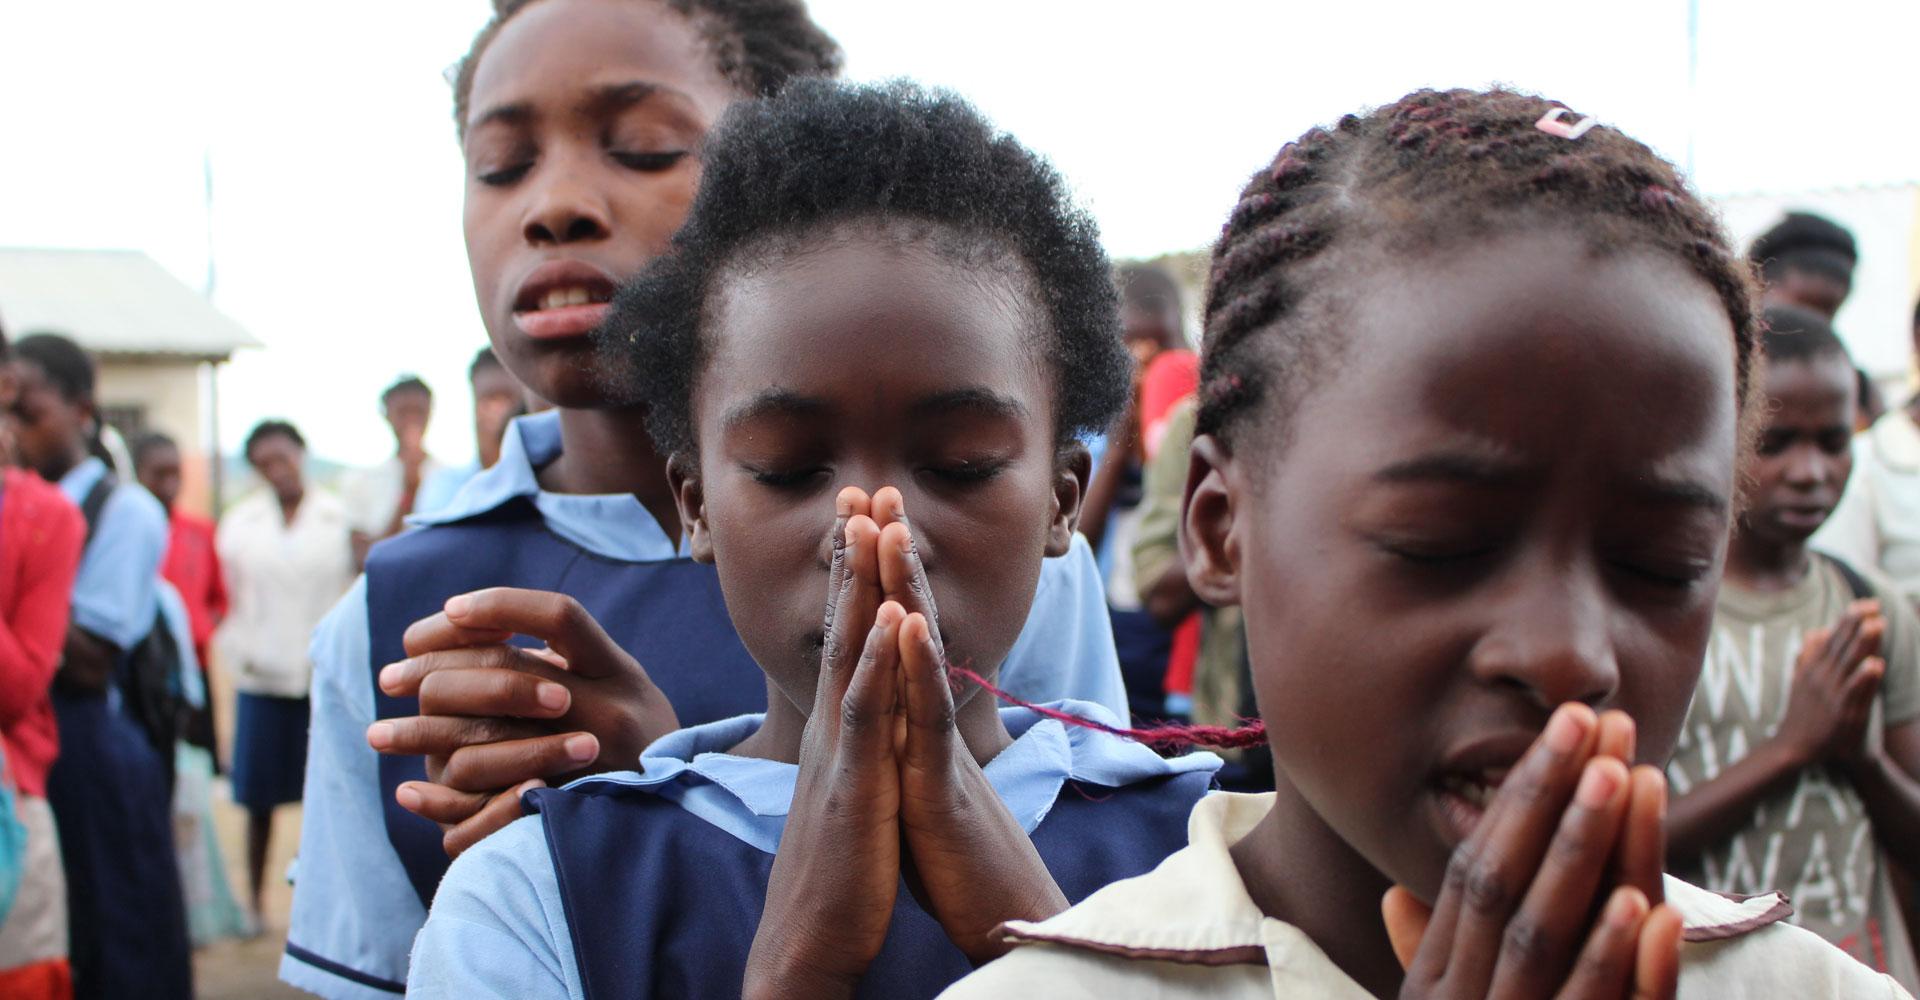 Praying For Sponsors